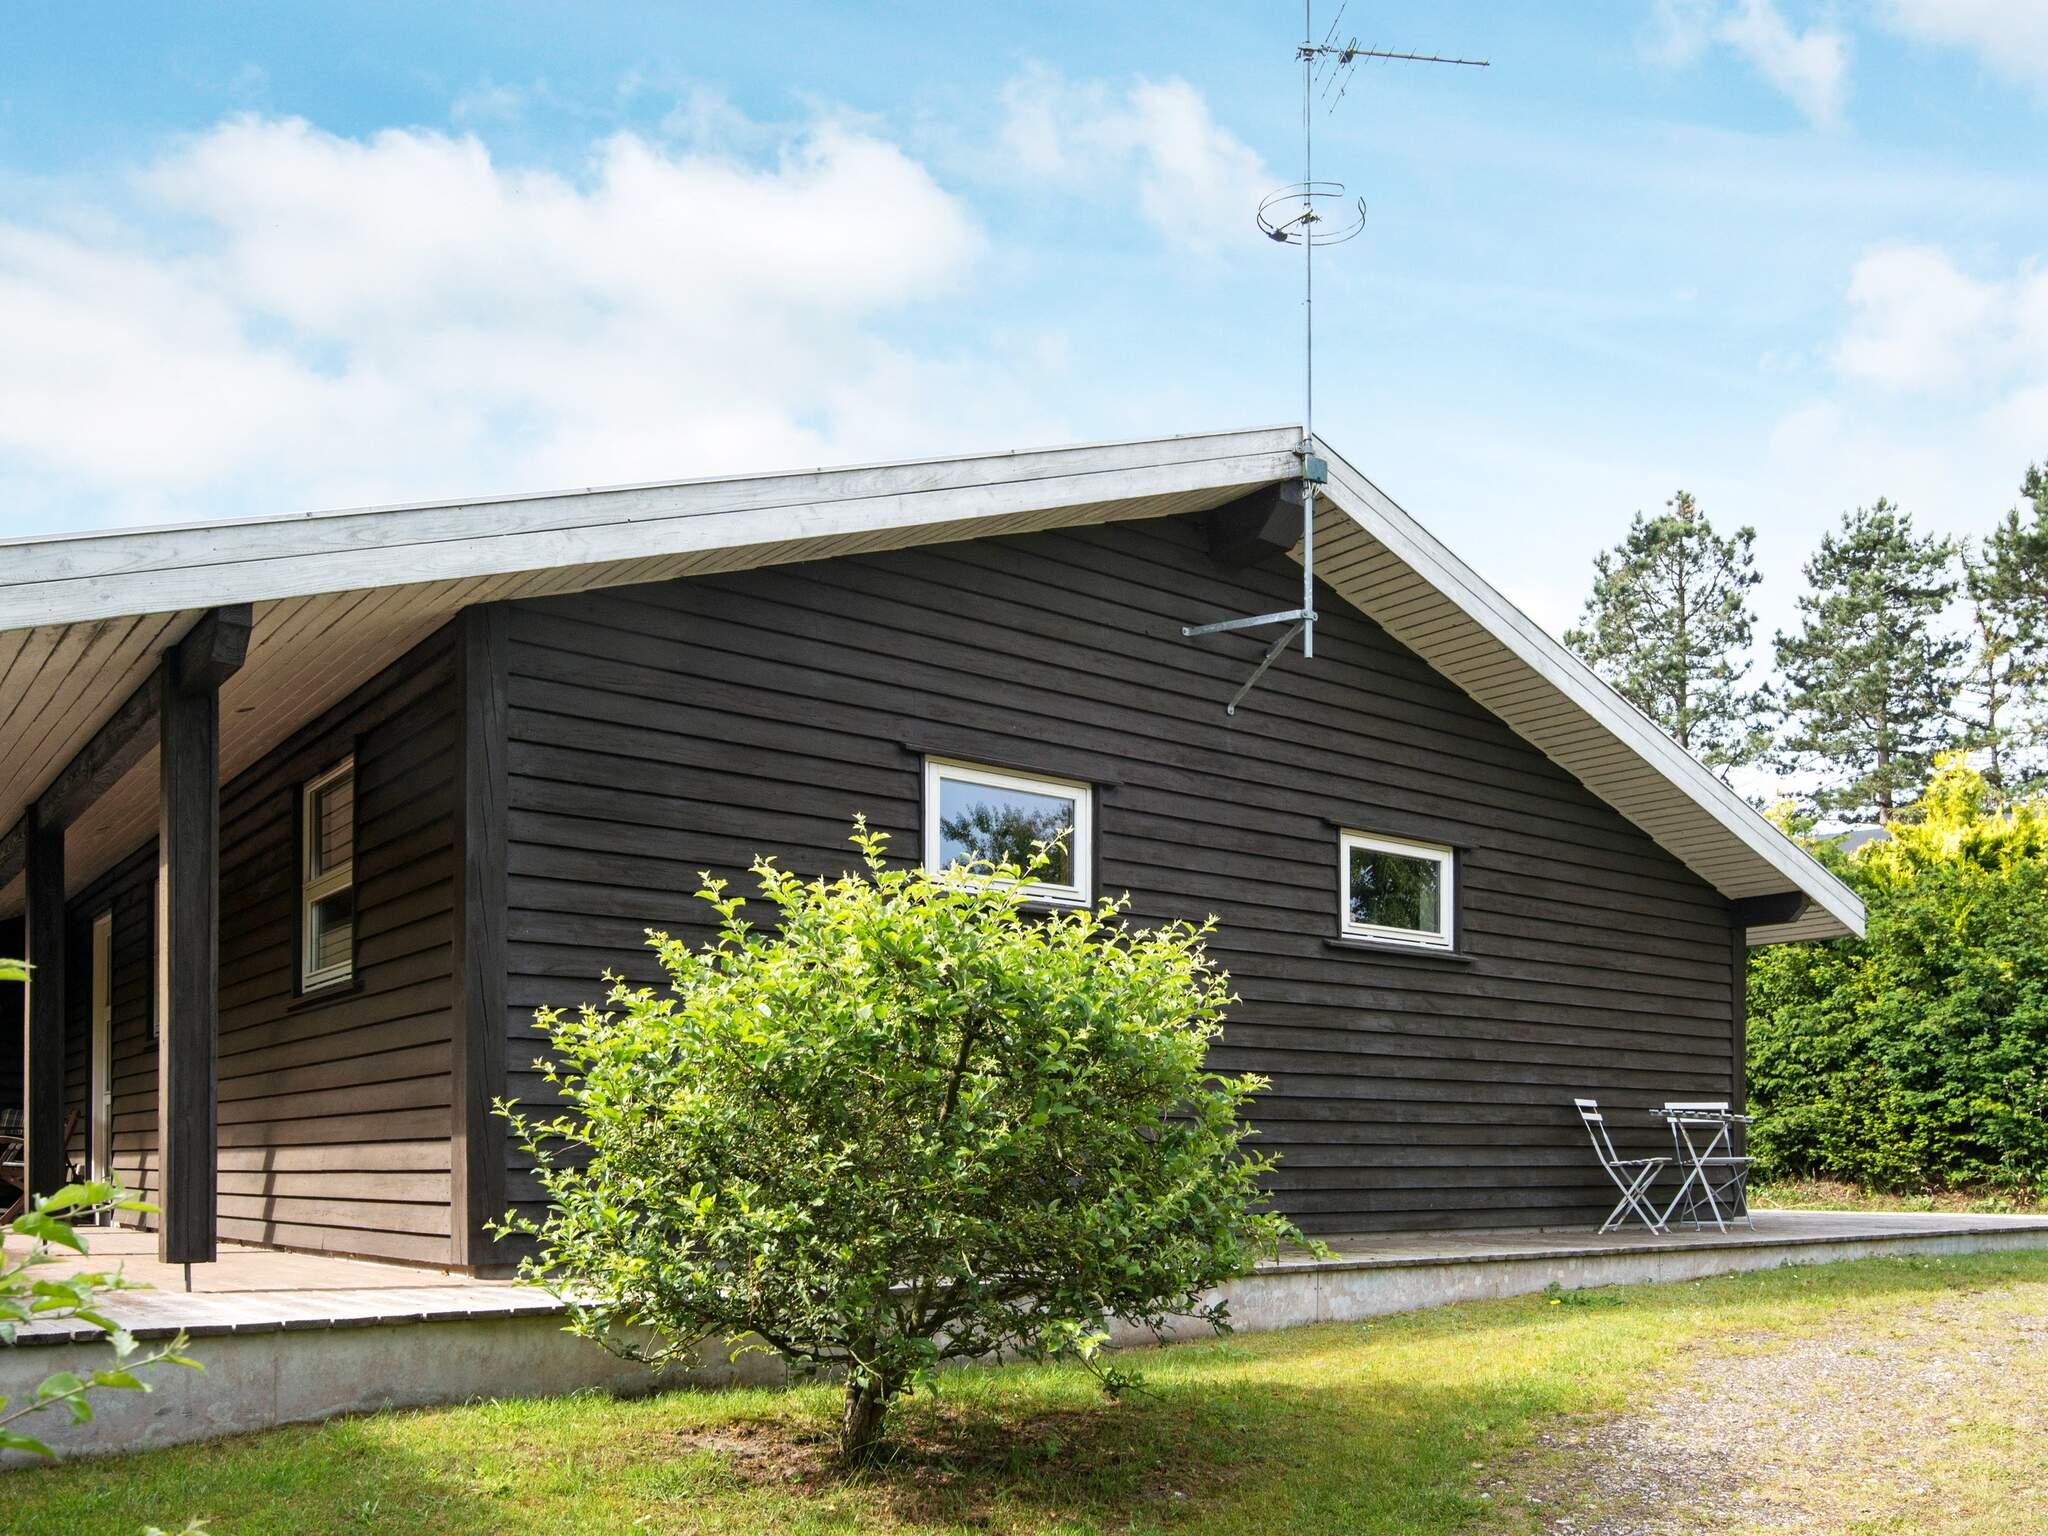 Ferienhaus Lyngsbæk (493913), Ebeltoft, , Ostjütland, Dänemark, Bild 17